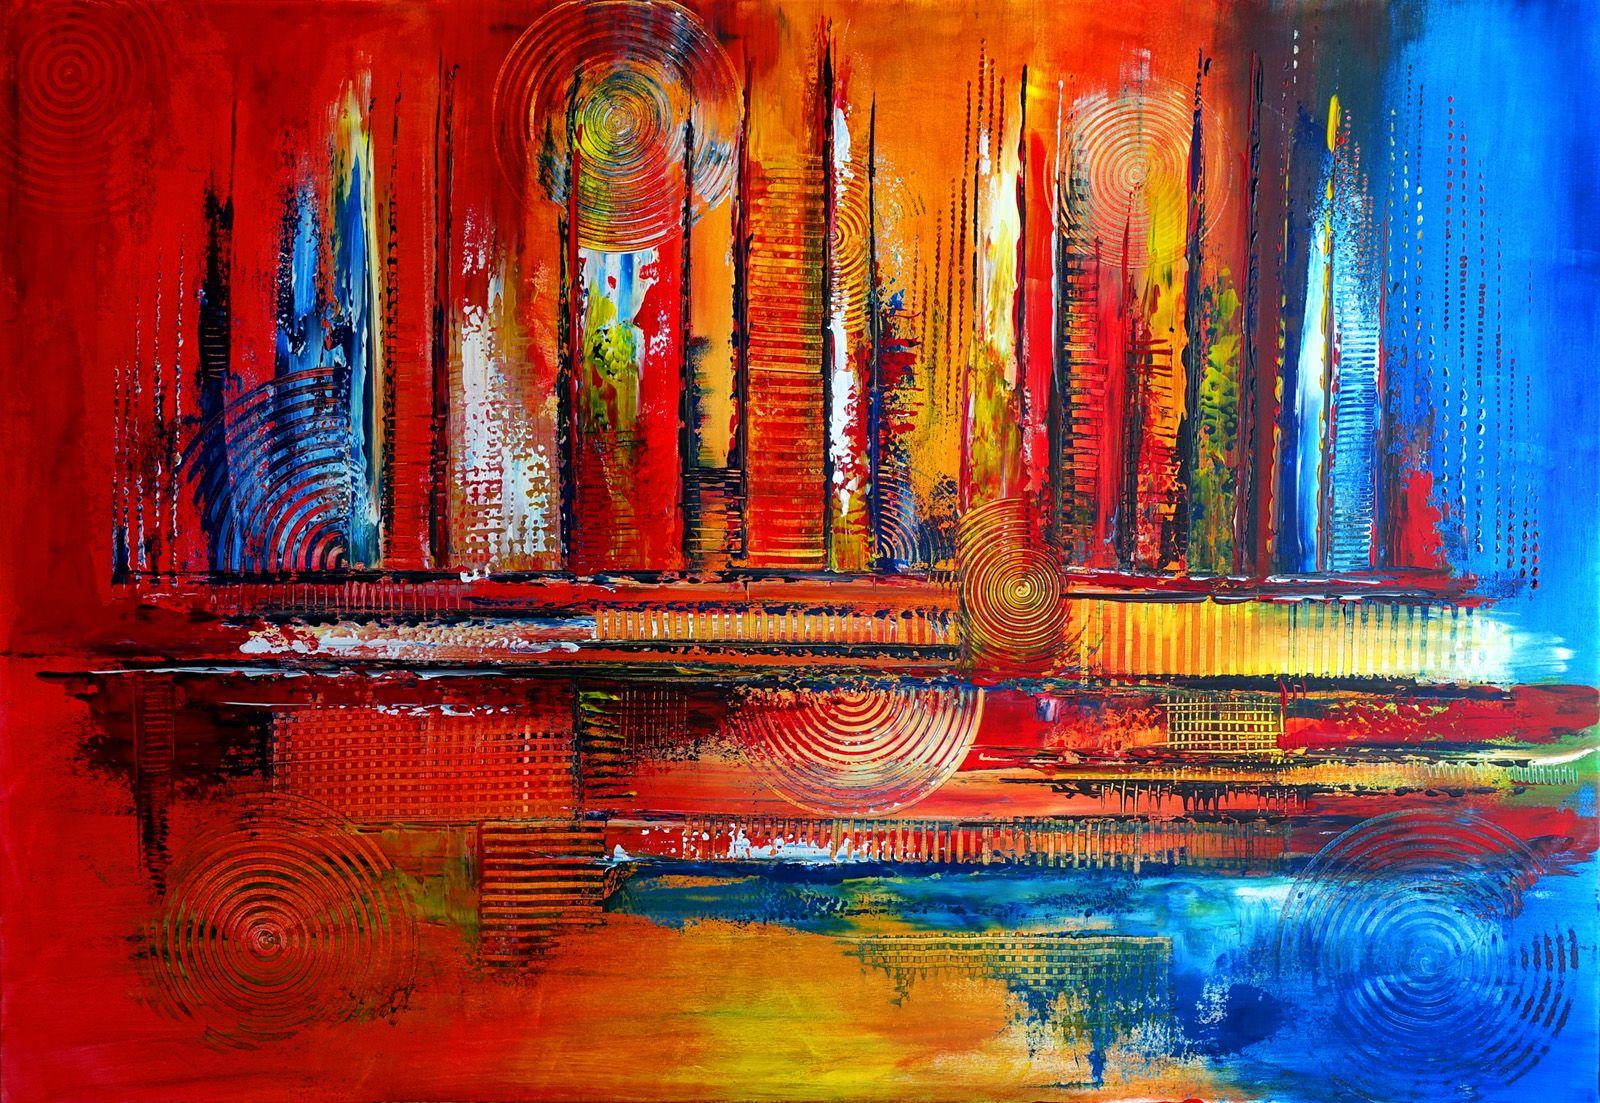 251 verkaufte abstrakte malerei rot blau querformat wandbilder original gemalde kunst kunstwerke unikat abstrakt abstraktes bild 599 geometrische formen